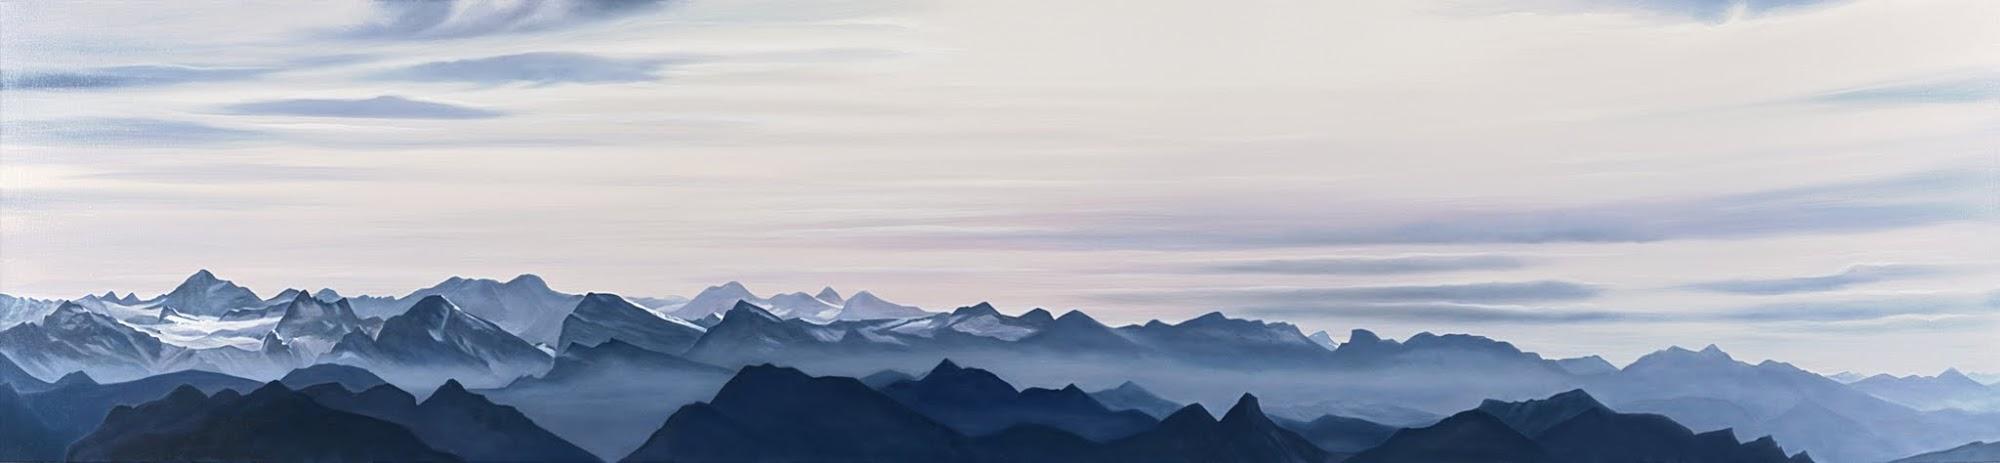 Alpenpanorama   2011   Oel auf Leinwand    65 x 270 cm